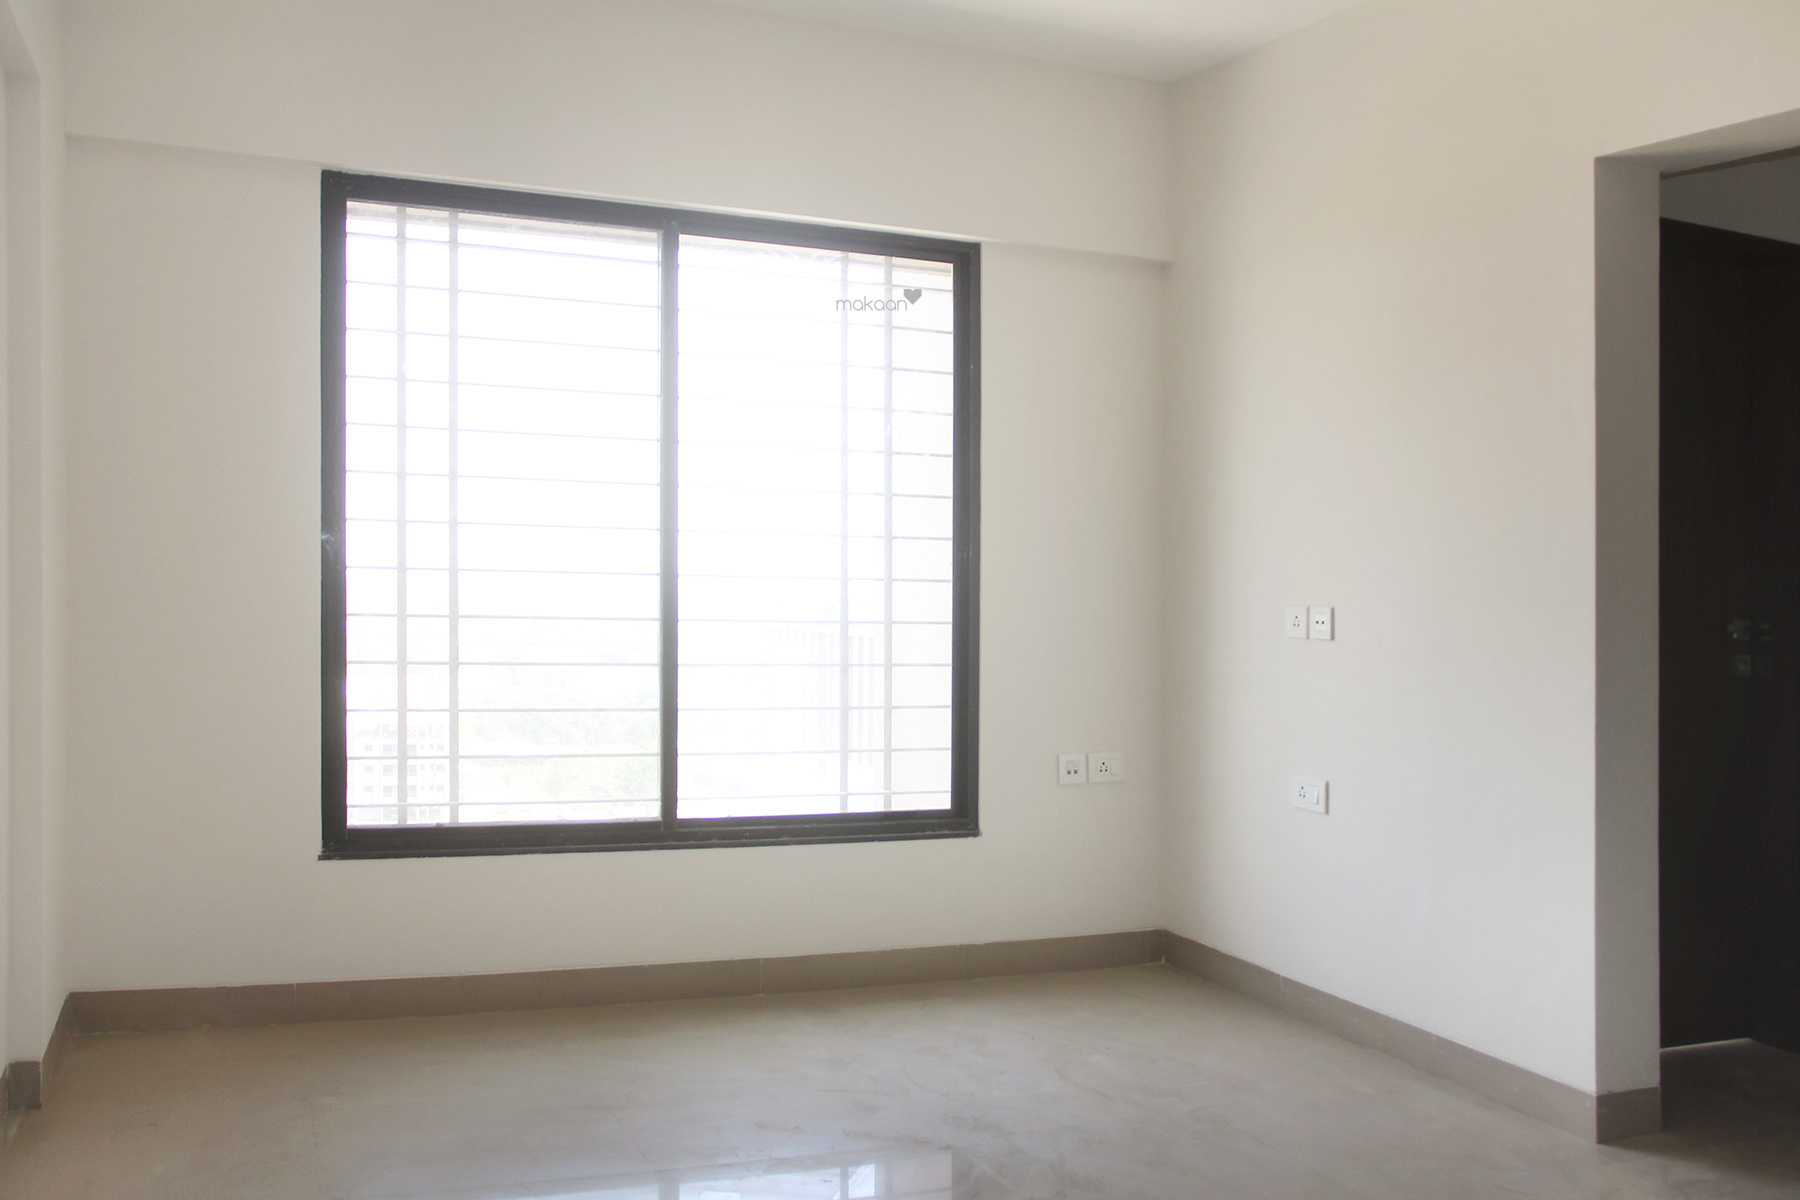 821 sq ft 1BHK 1BHK+1T (821 sq ft) Property By Proptiger In Grand Bay, Manjari